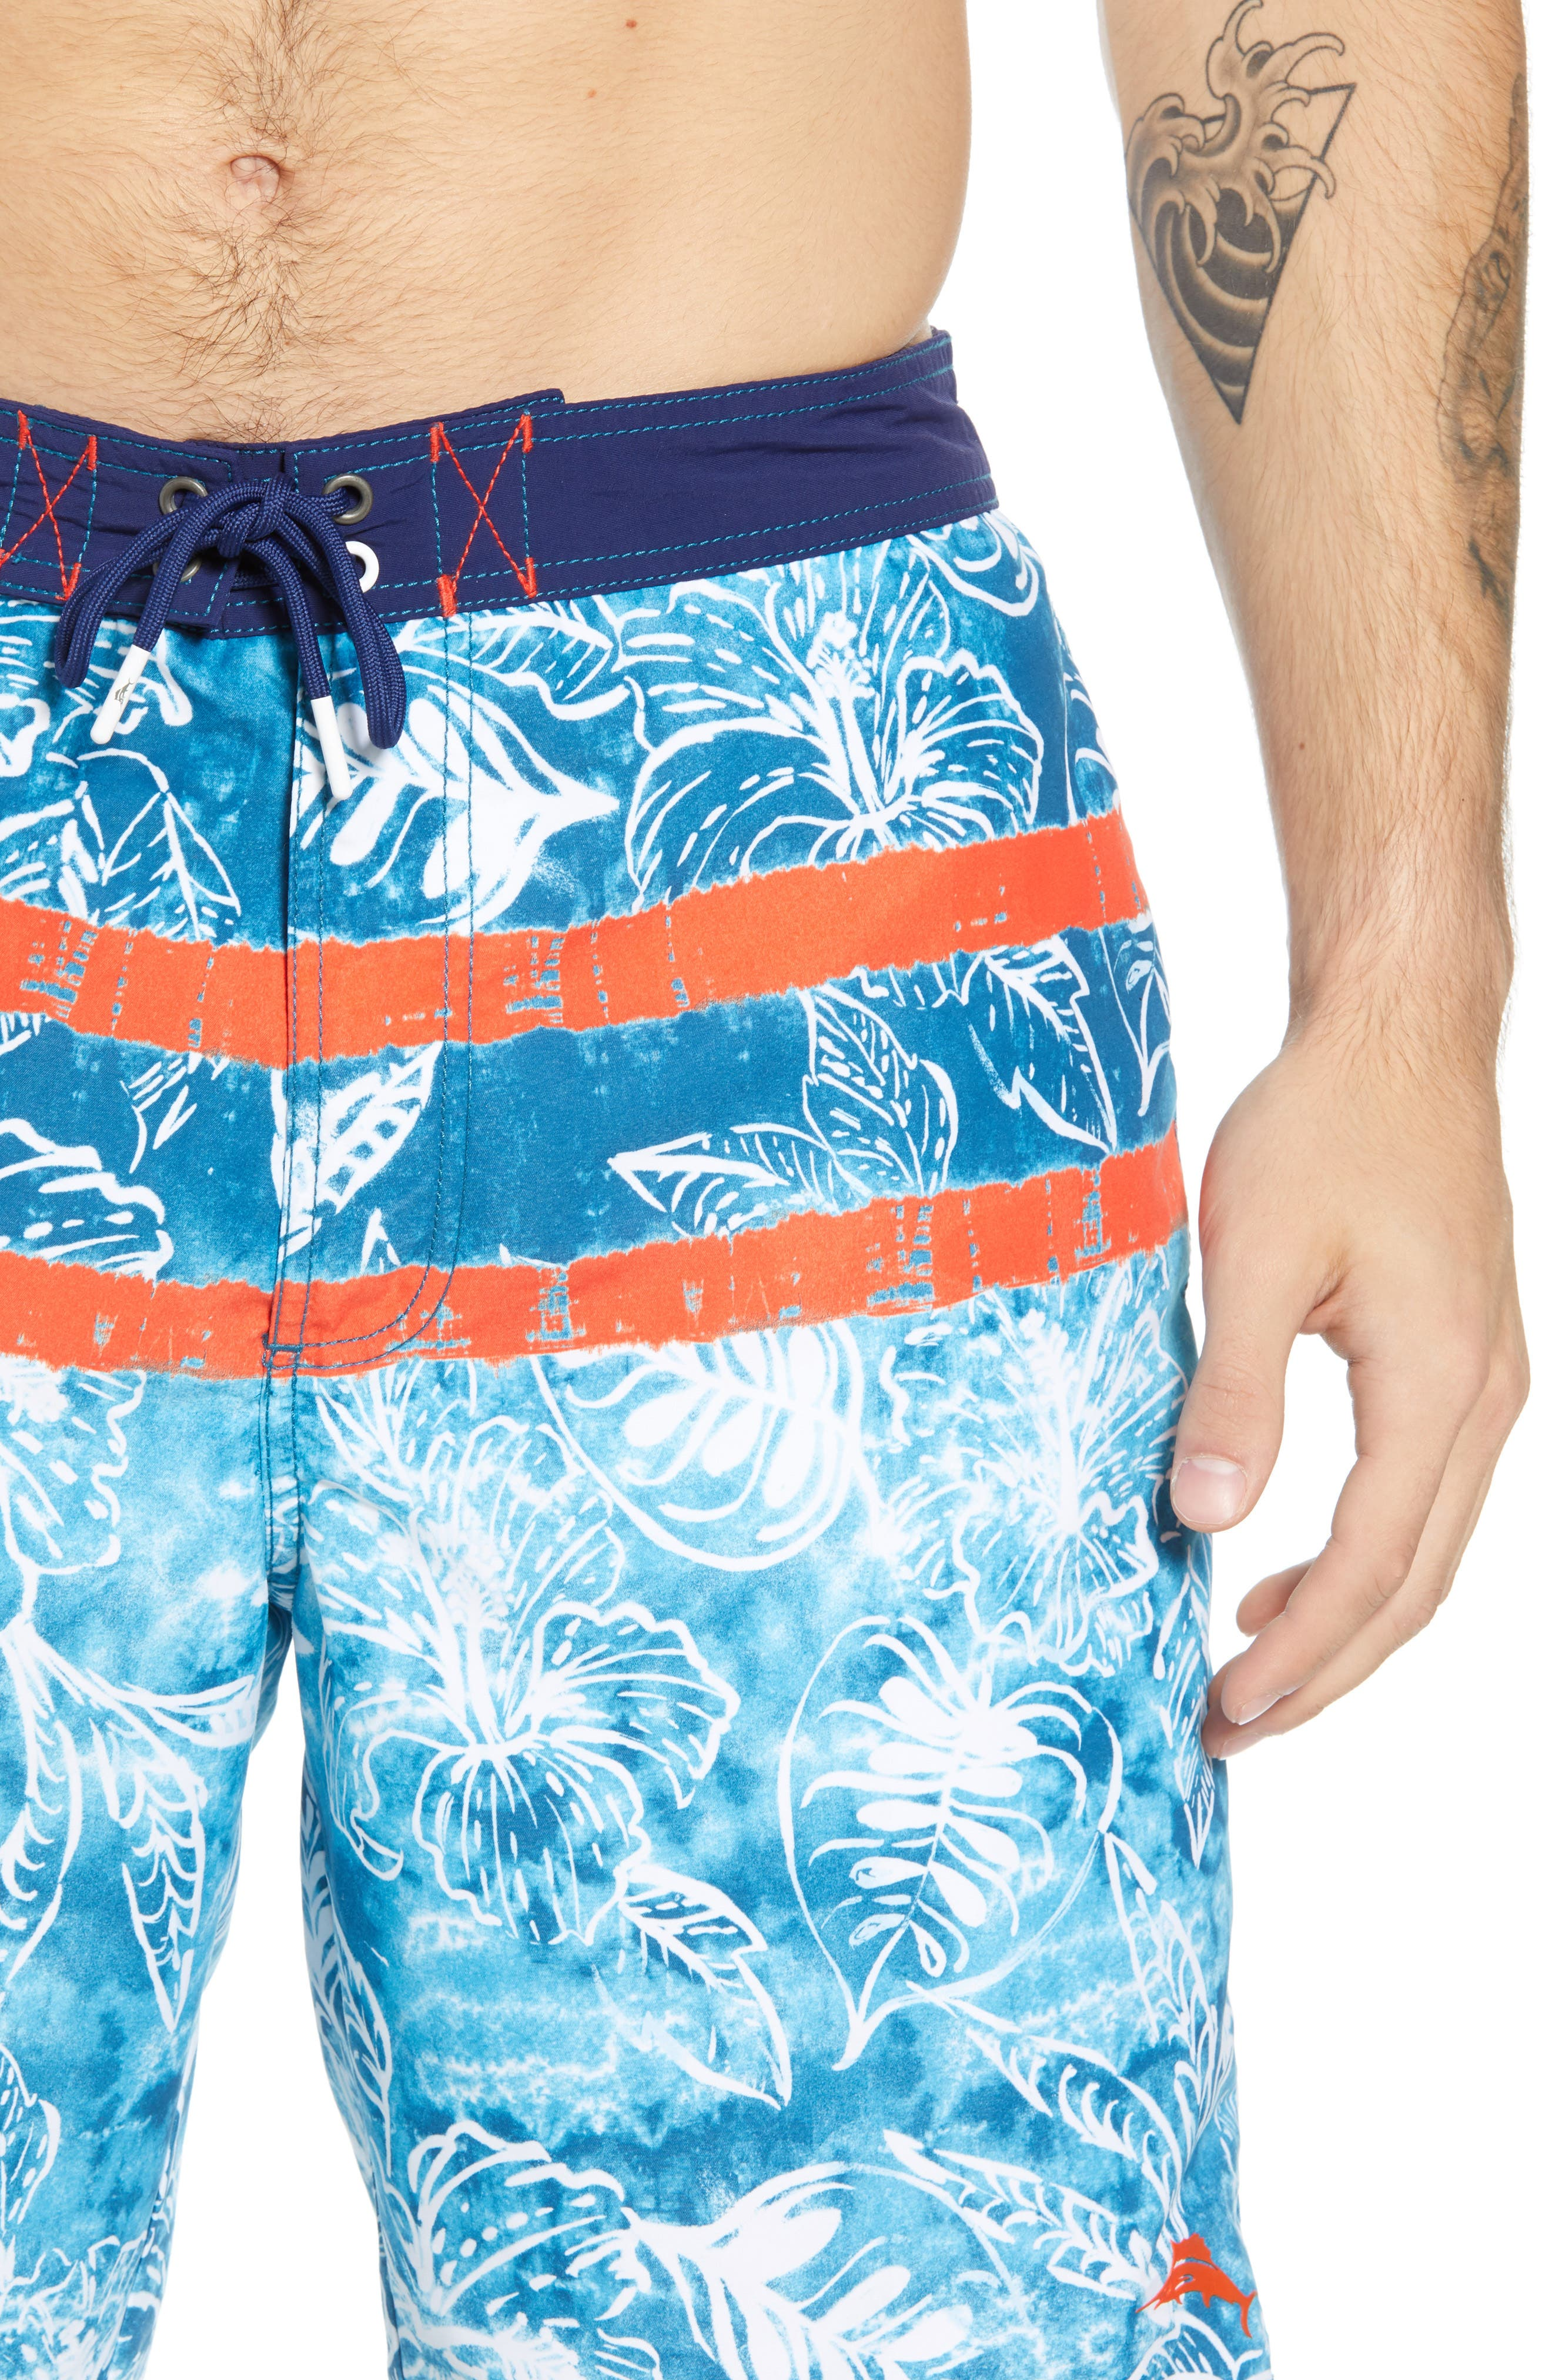 Baja Mar Batik Print Board Shorts,                             Alternate thumbnail 4, color,                             RIVIERA AZURE